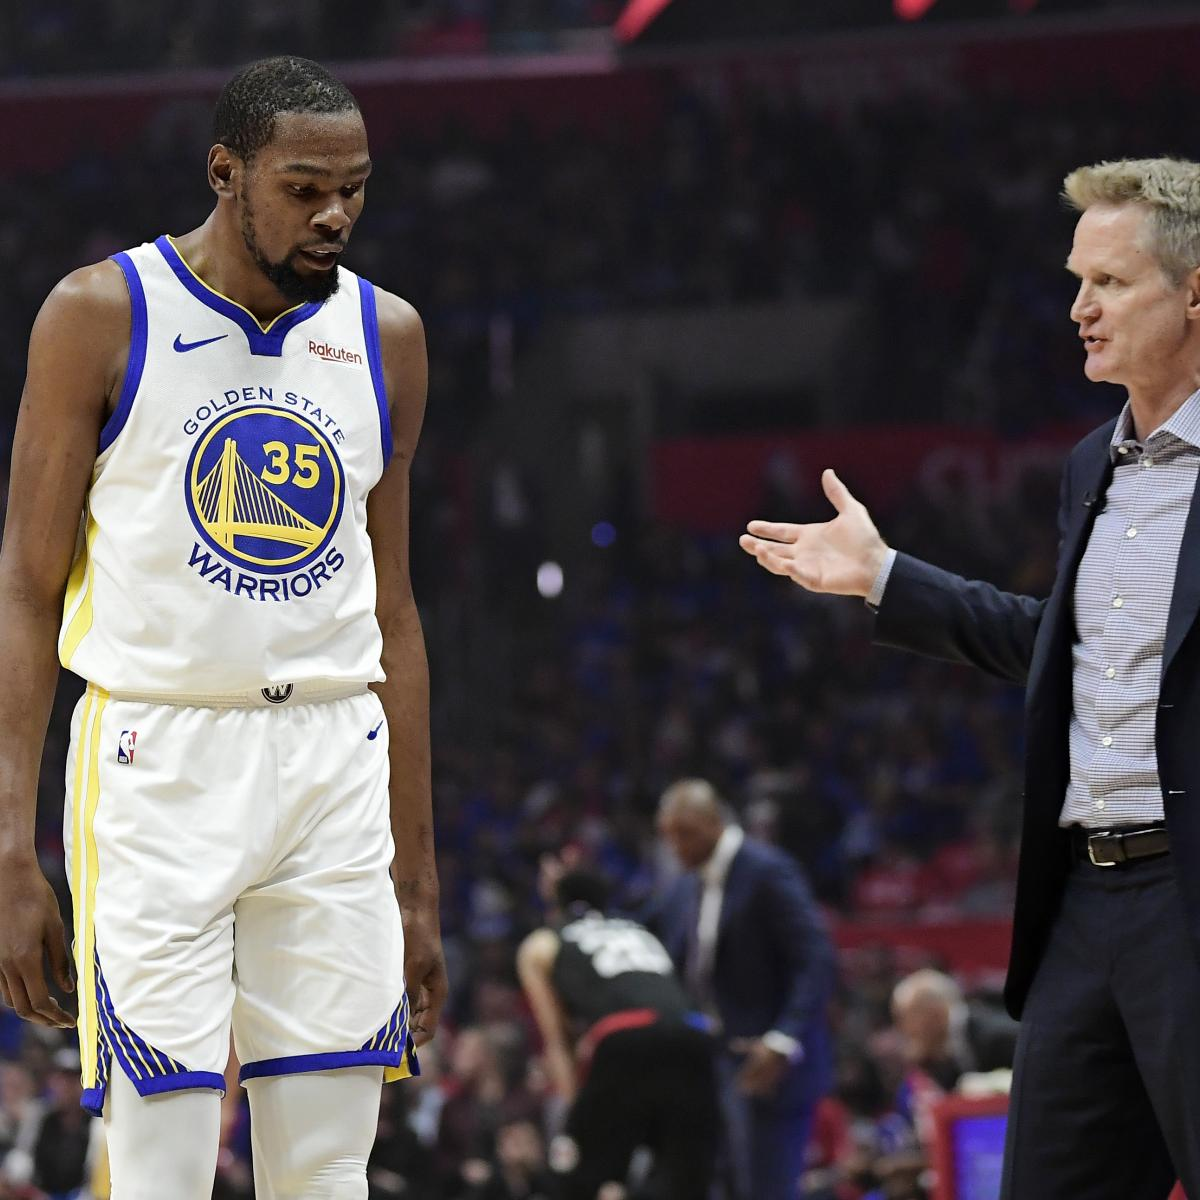 Nuggets Playoff Tickets 2019: NBA Playoffs 2019: Saturday TV Schedule, Odds And Bracket